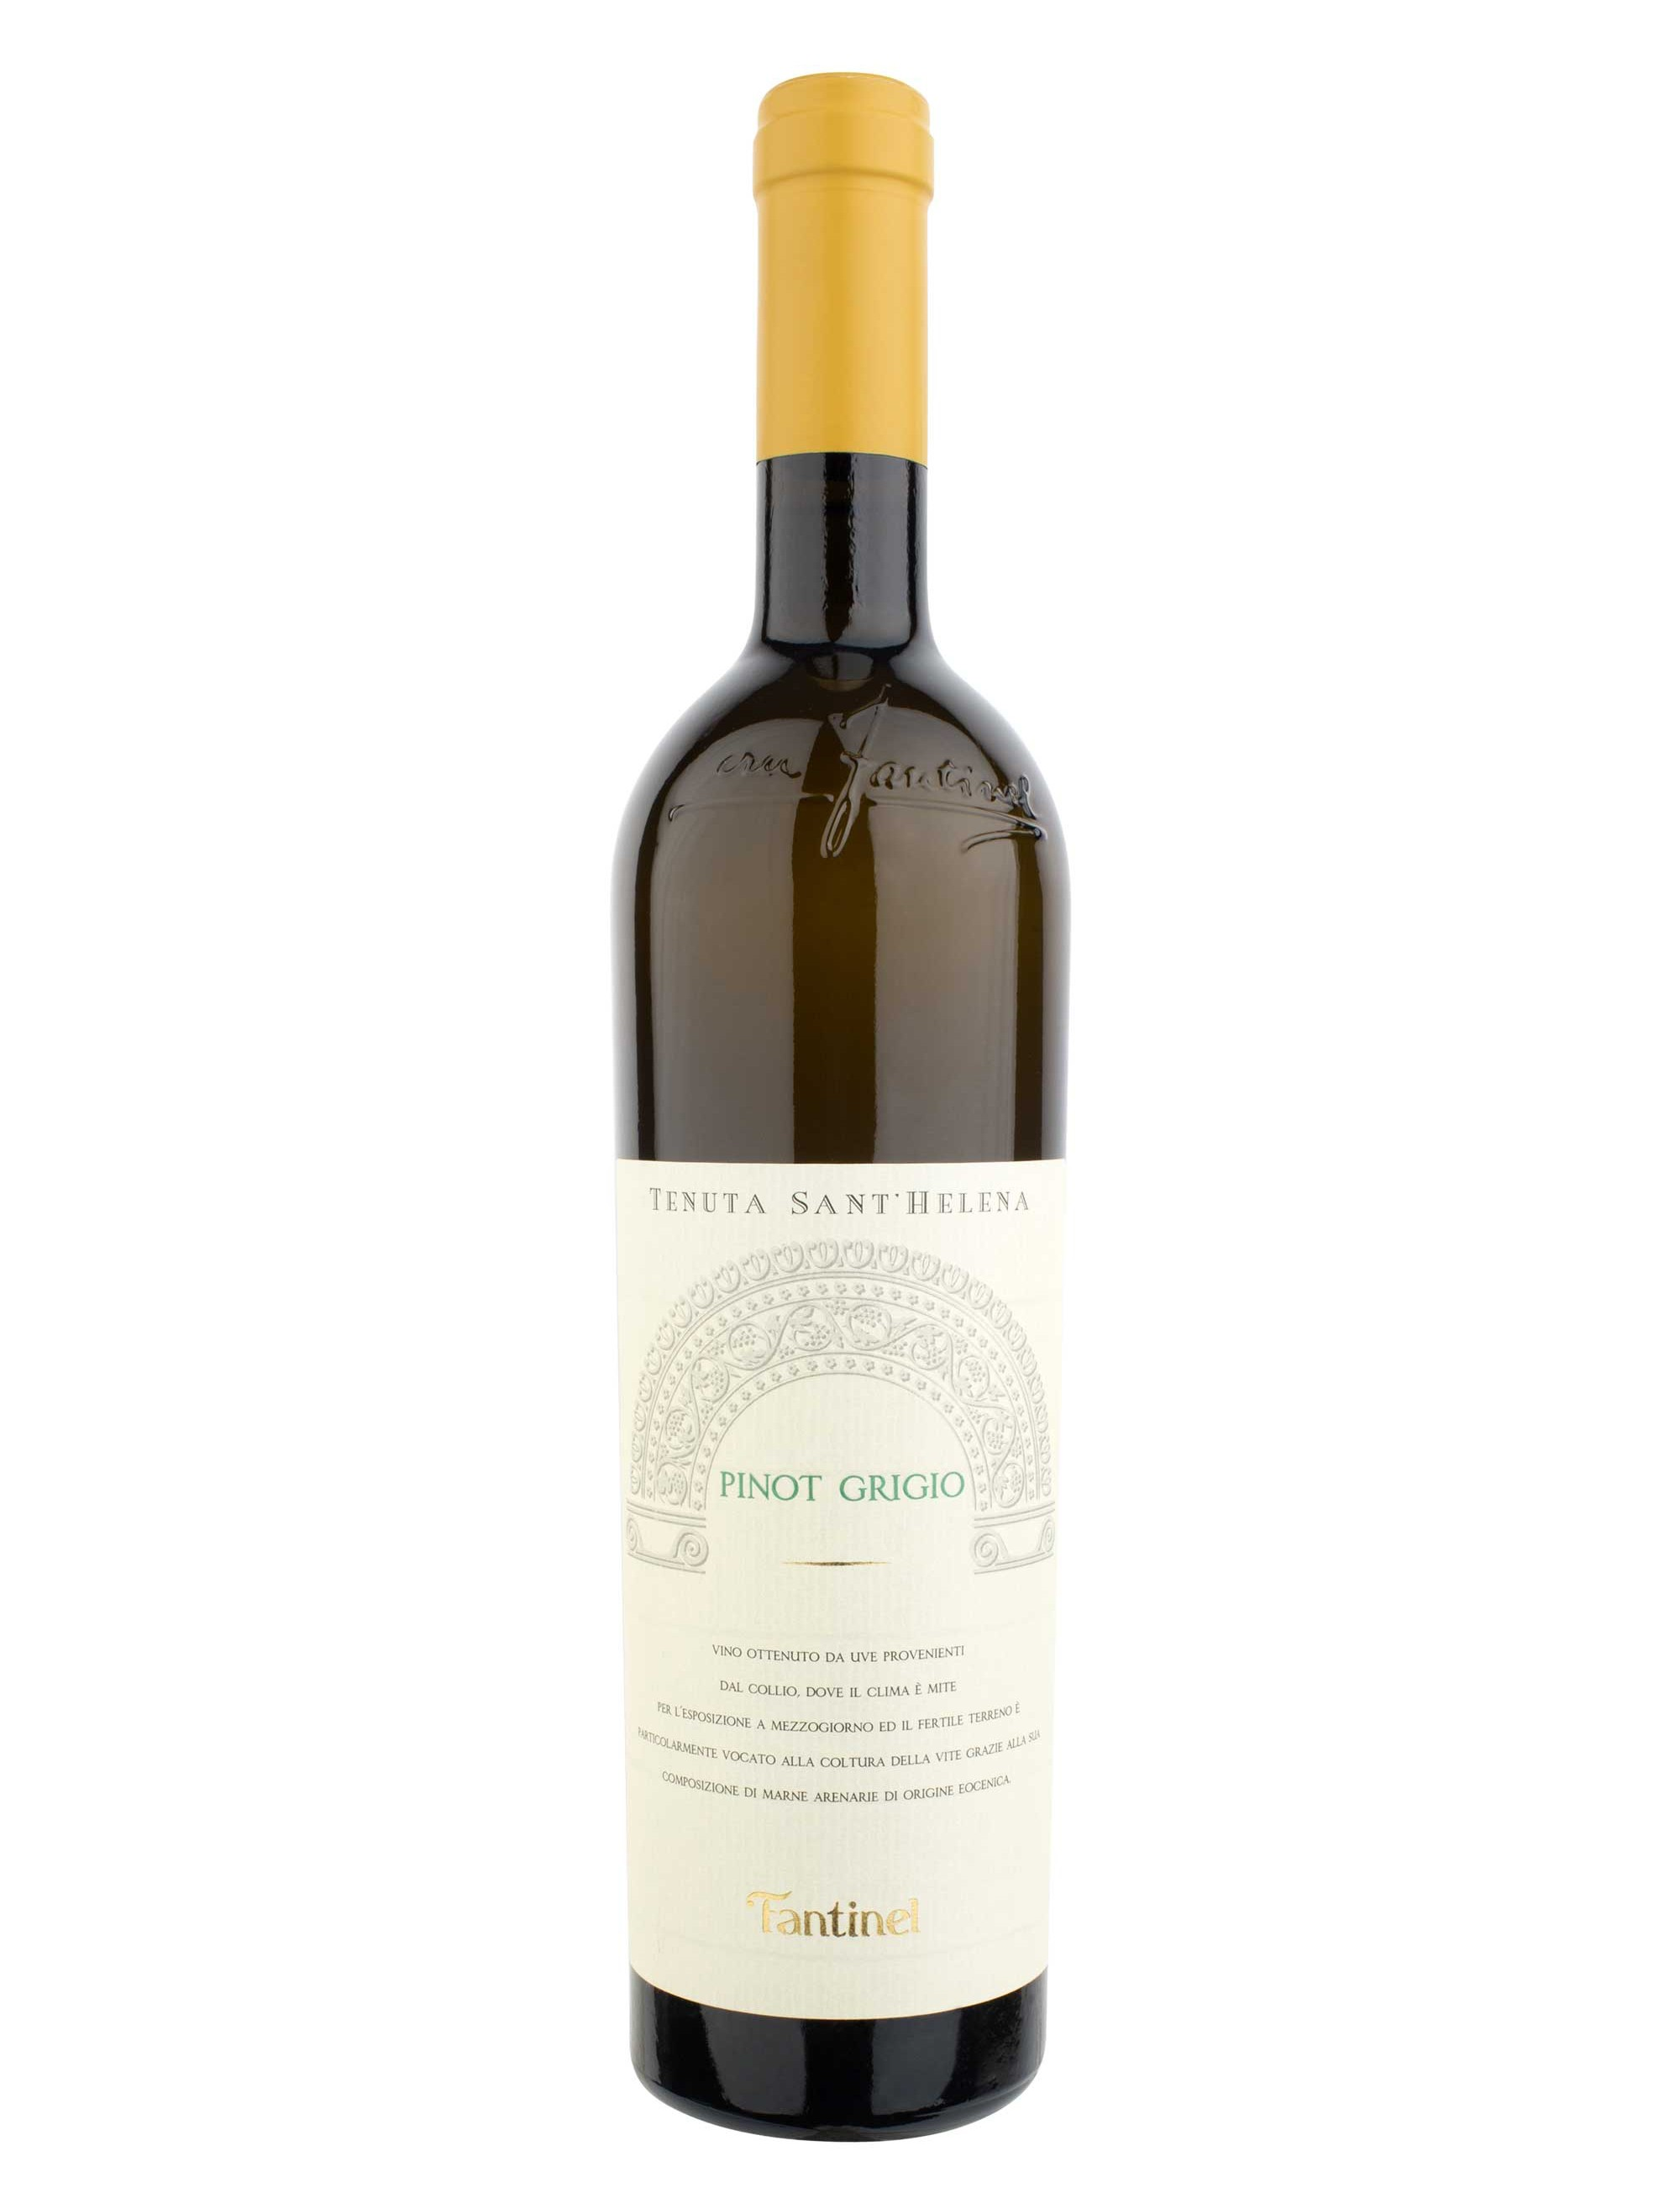 2561d133 Fantinel - Tenuta Sant'Helena - Pinot Grigio D.O.C. Collio - White Wine -  Avvenice